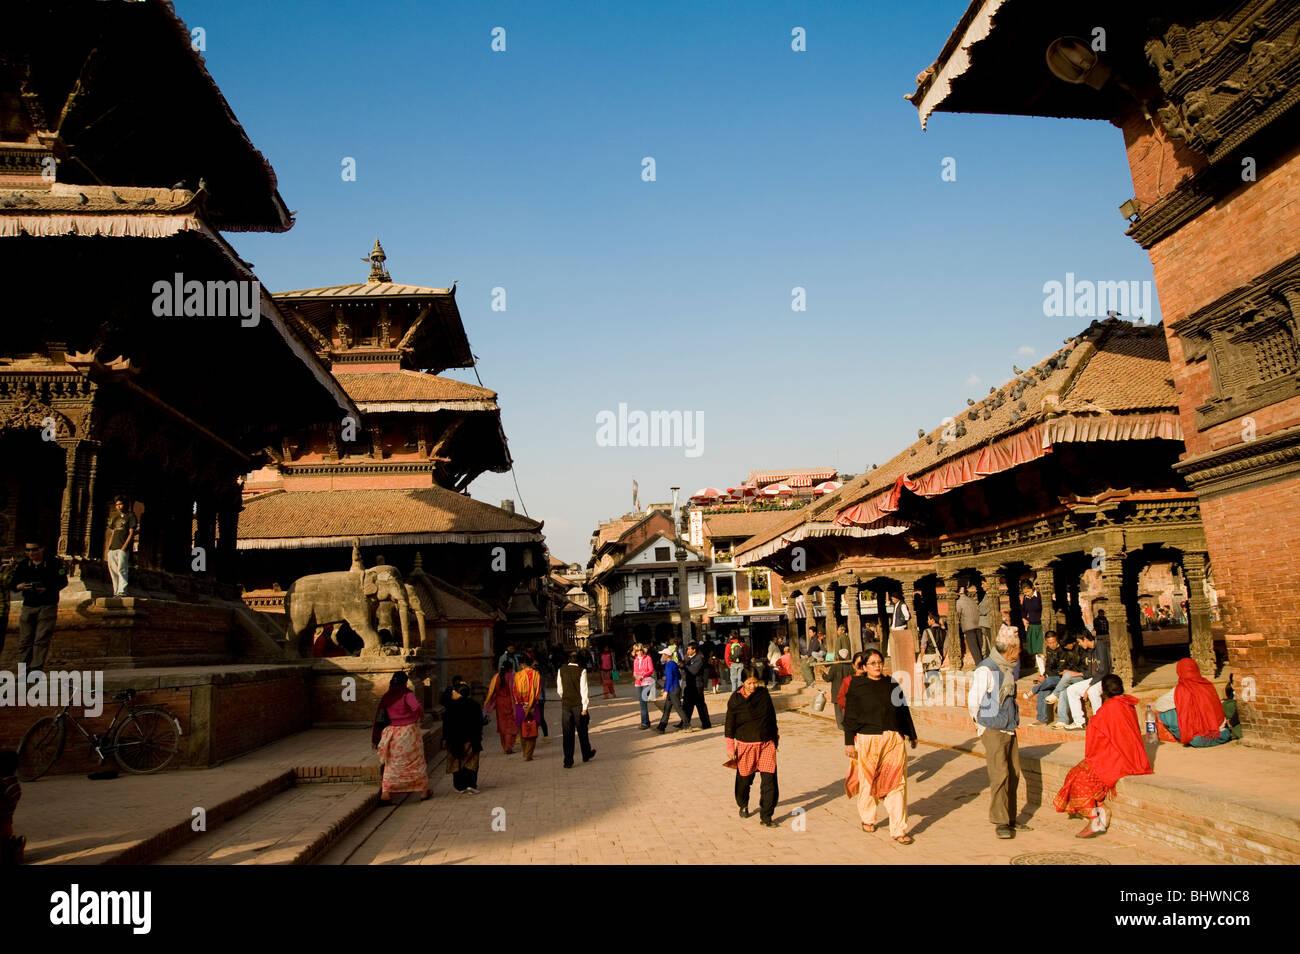 Durbar Square, Patan, Kathmandu, Nepal Stockbild